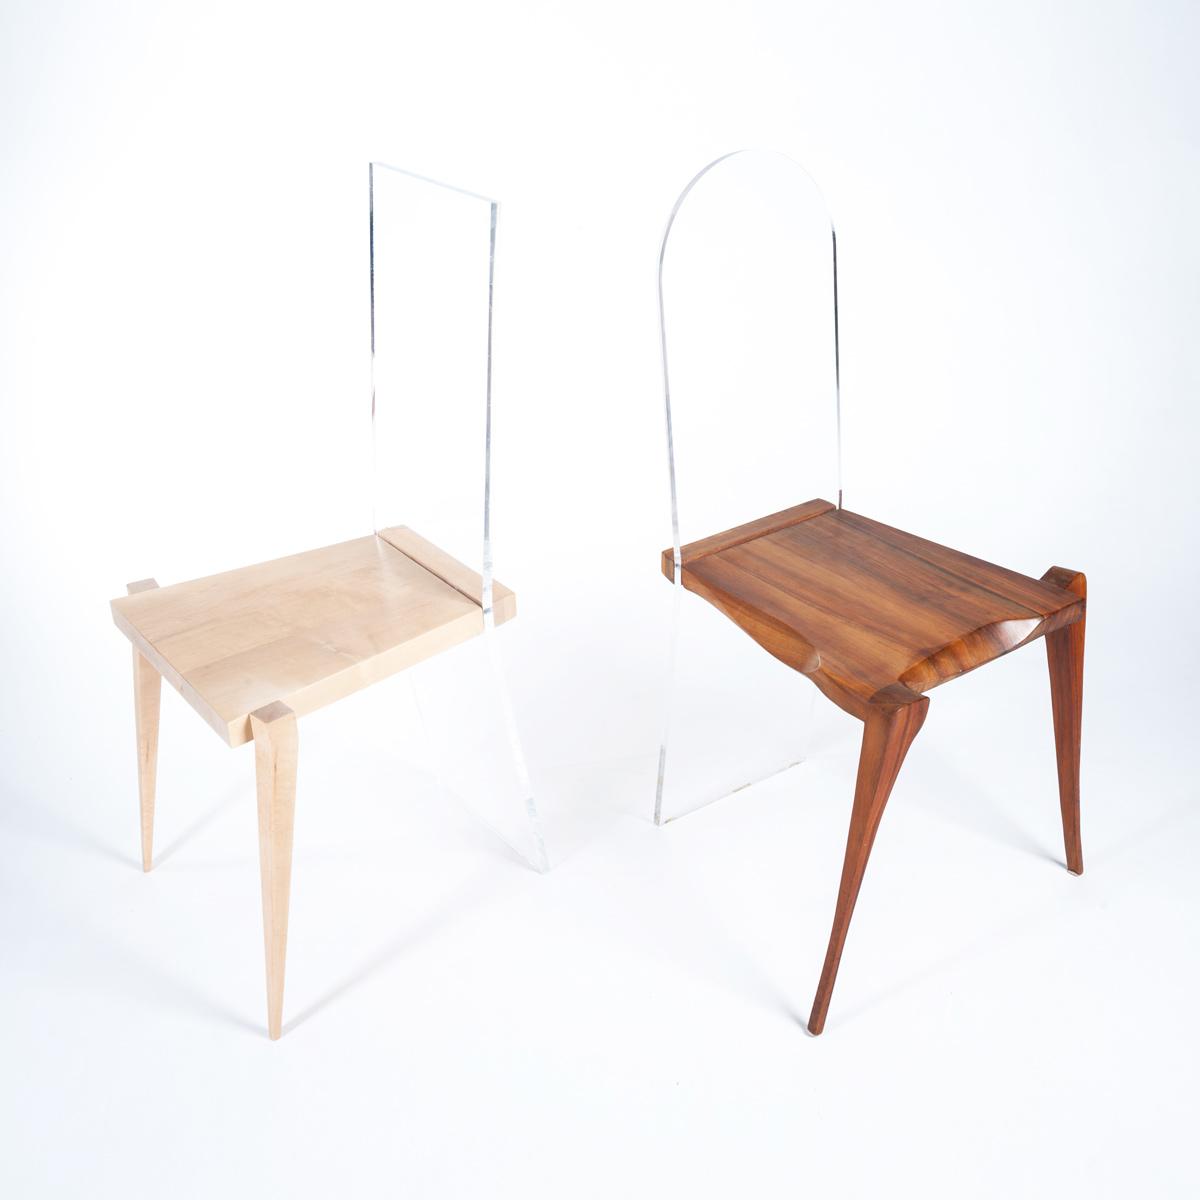 Stuhl KALLISTUS und Stuhl FIDELIS, JK. Designermöbel